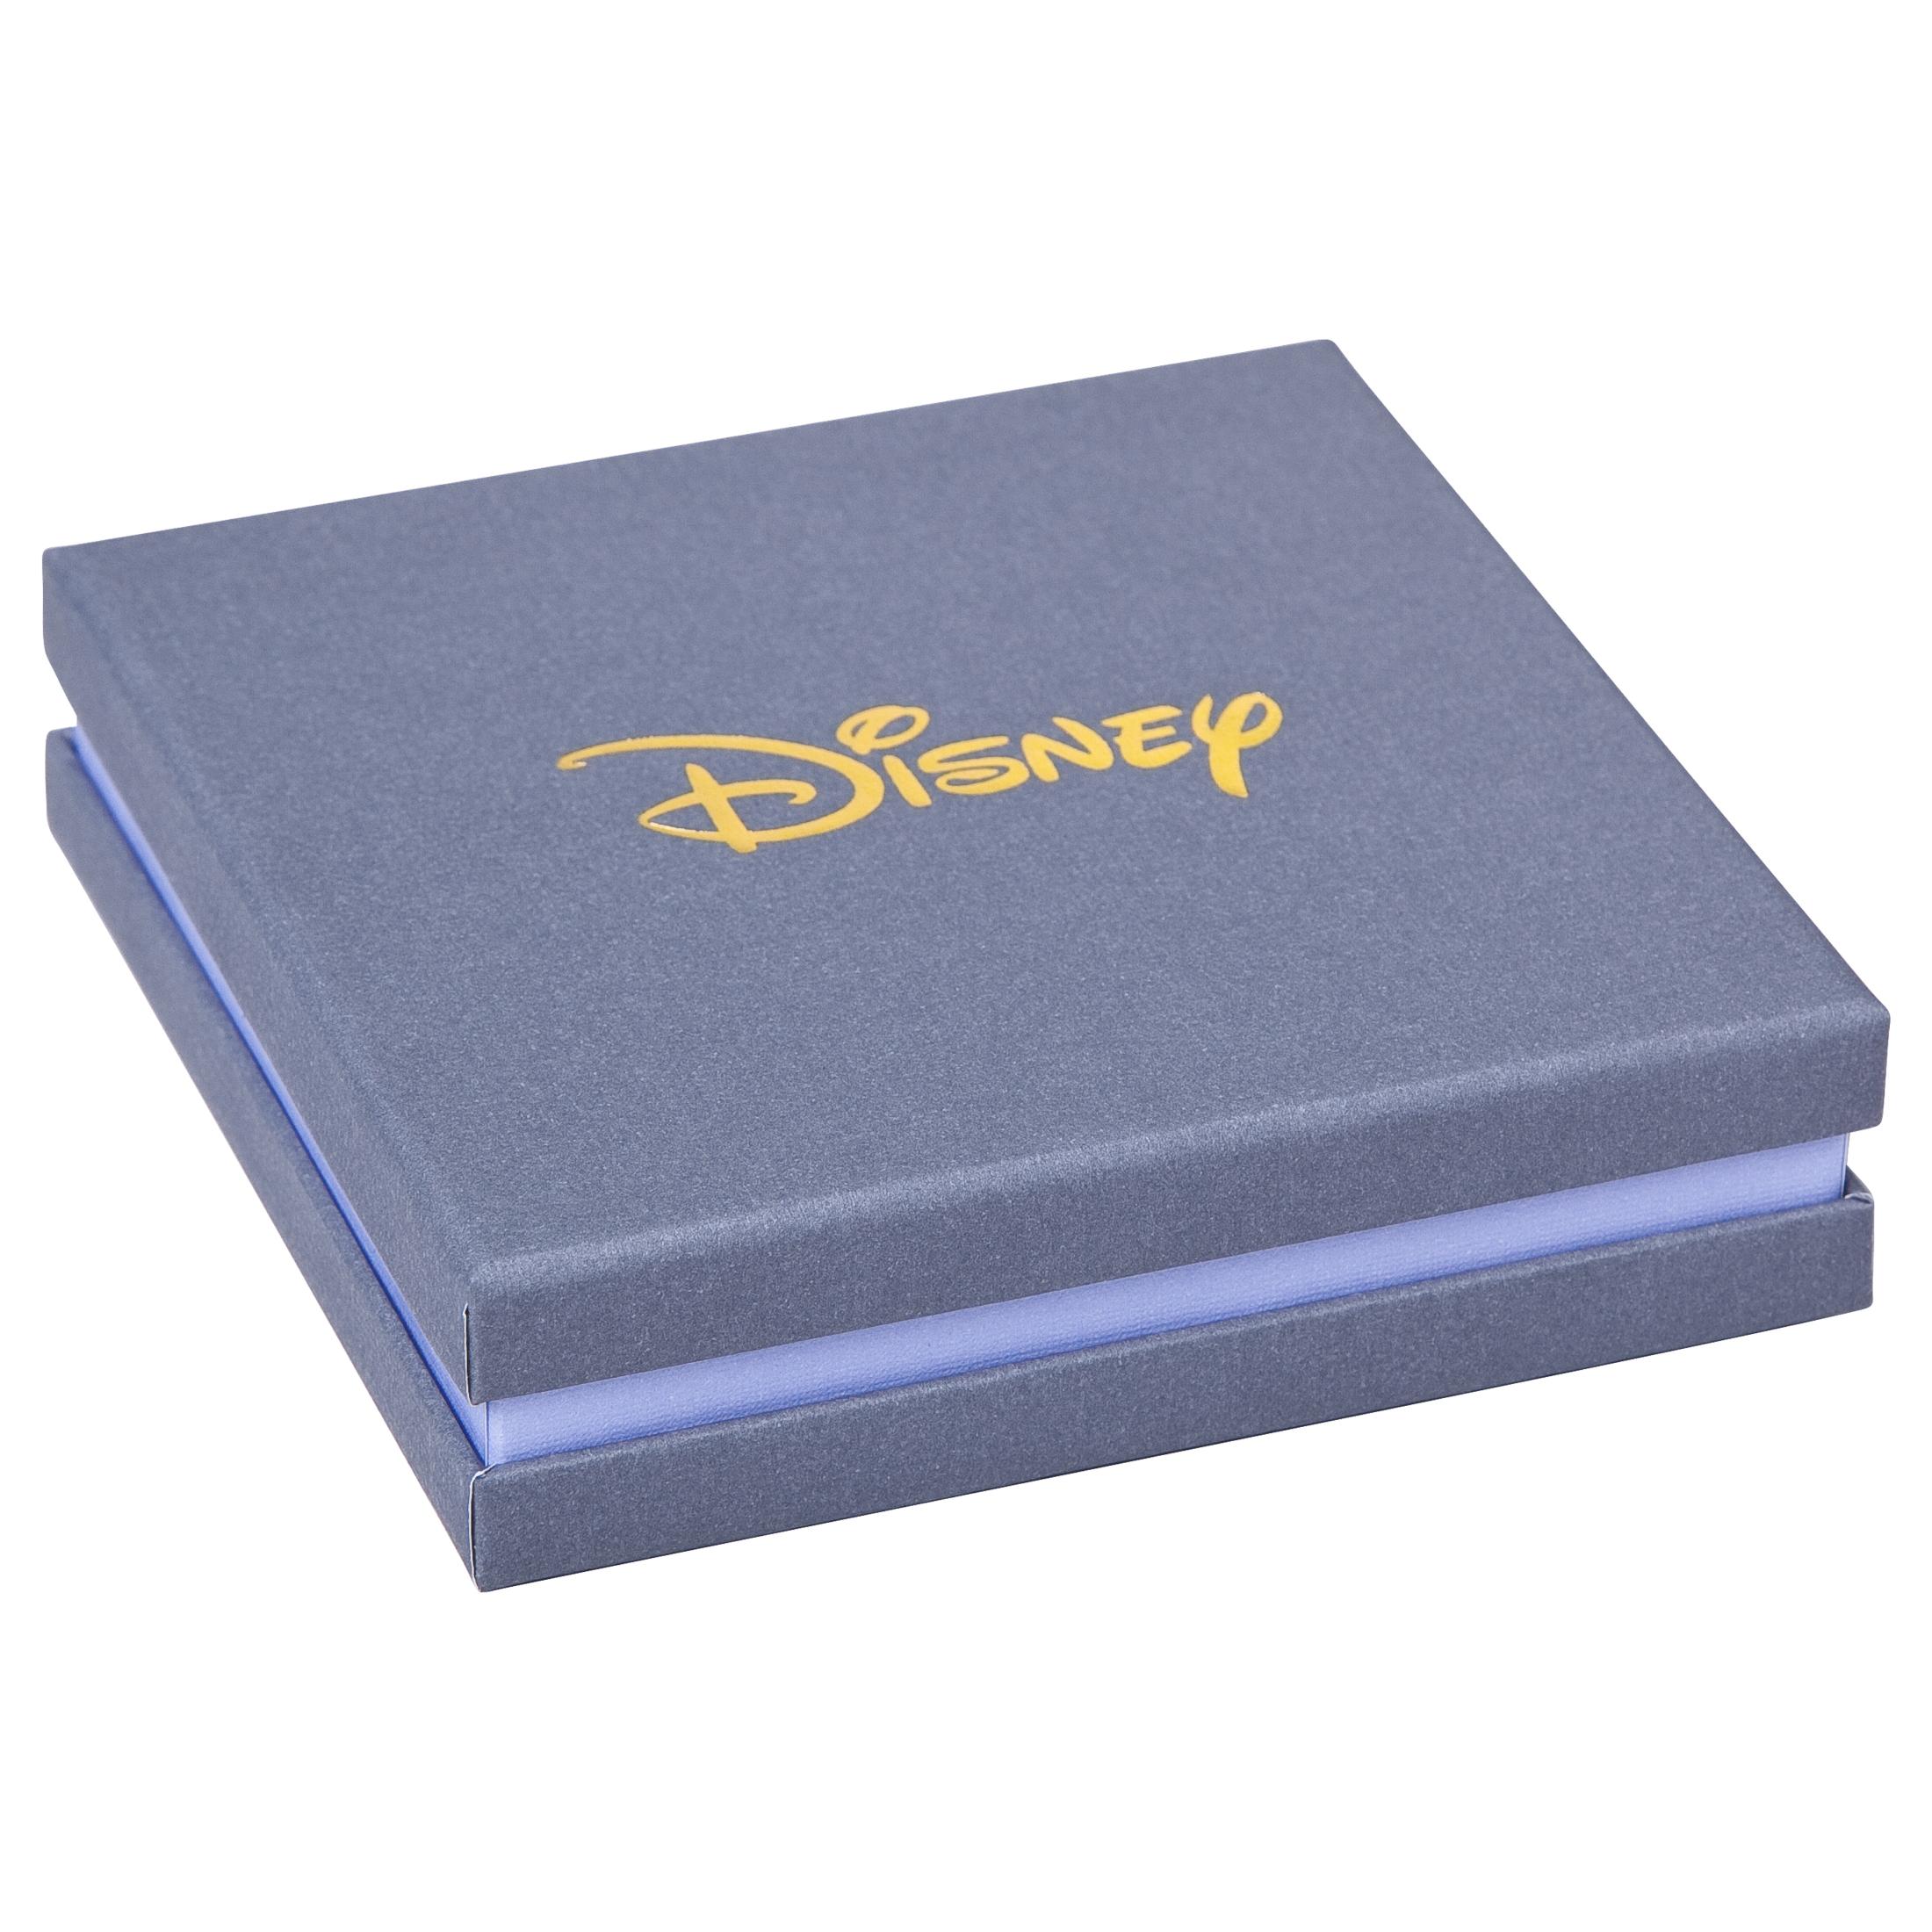 Magische Feder, Disney Dumbo, CK, mit Swarovski® Kristallen, Goebel Porzellan